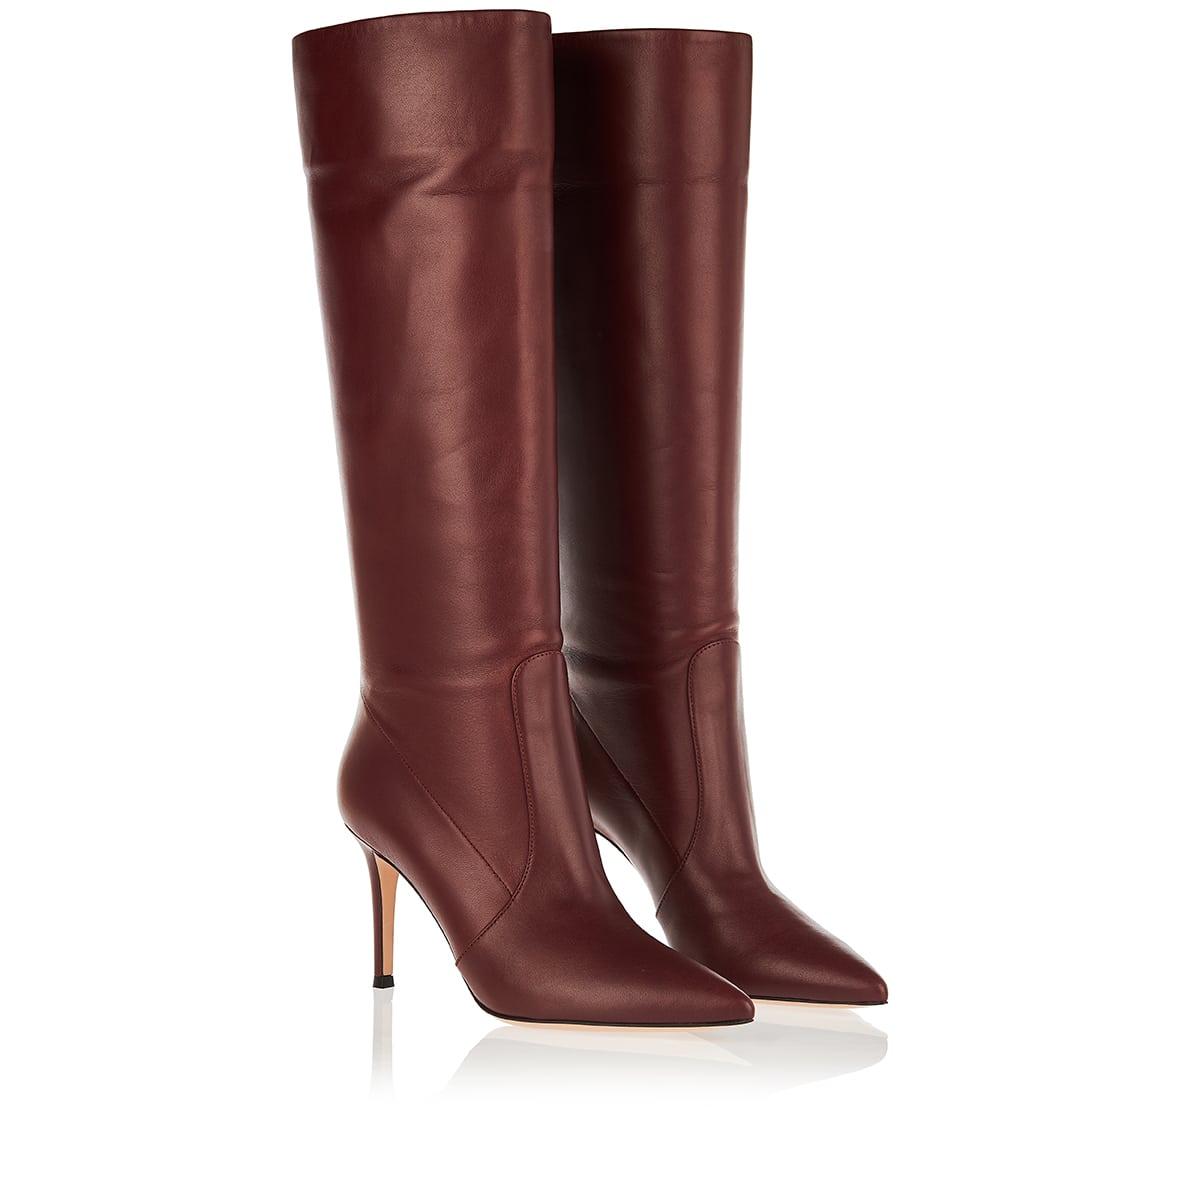 Hansen knee-high leather boots